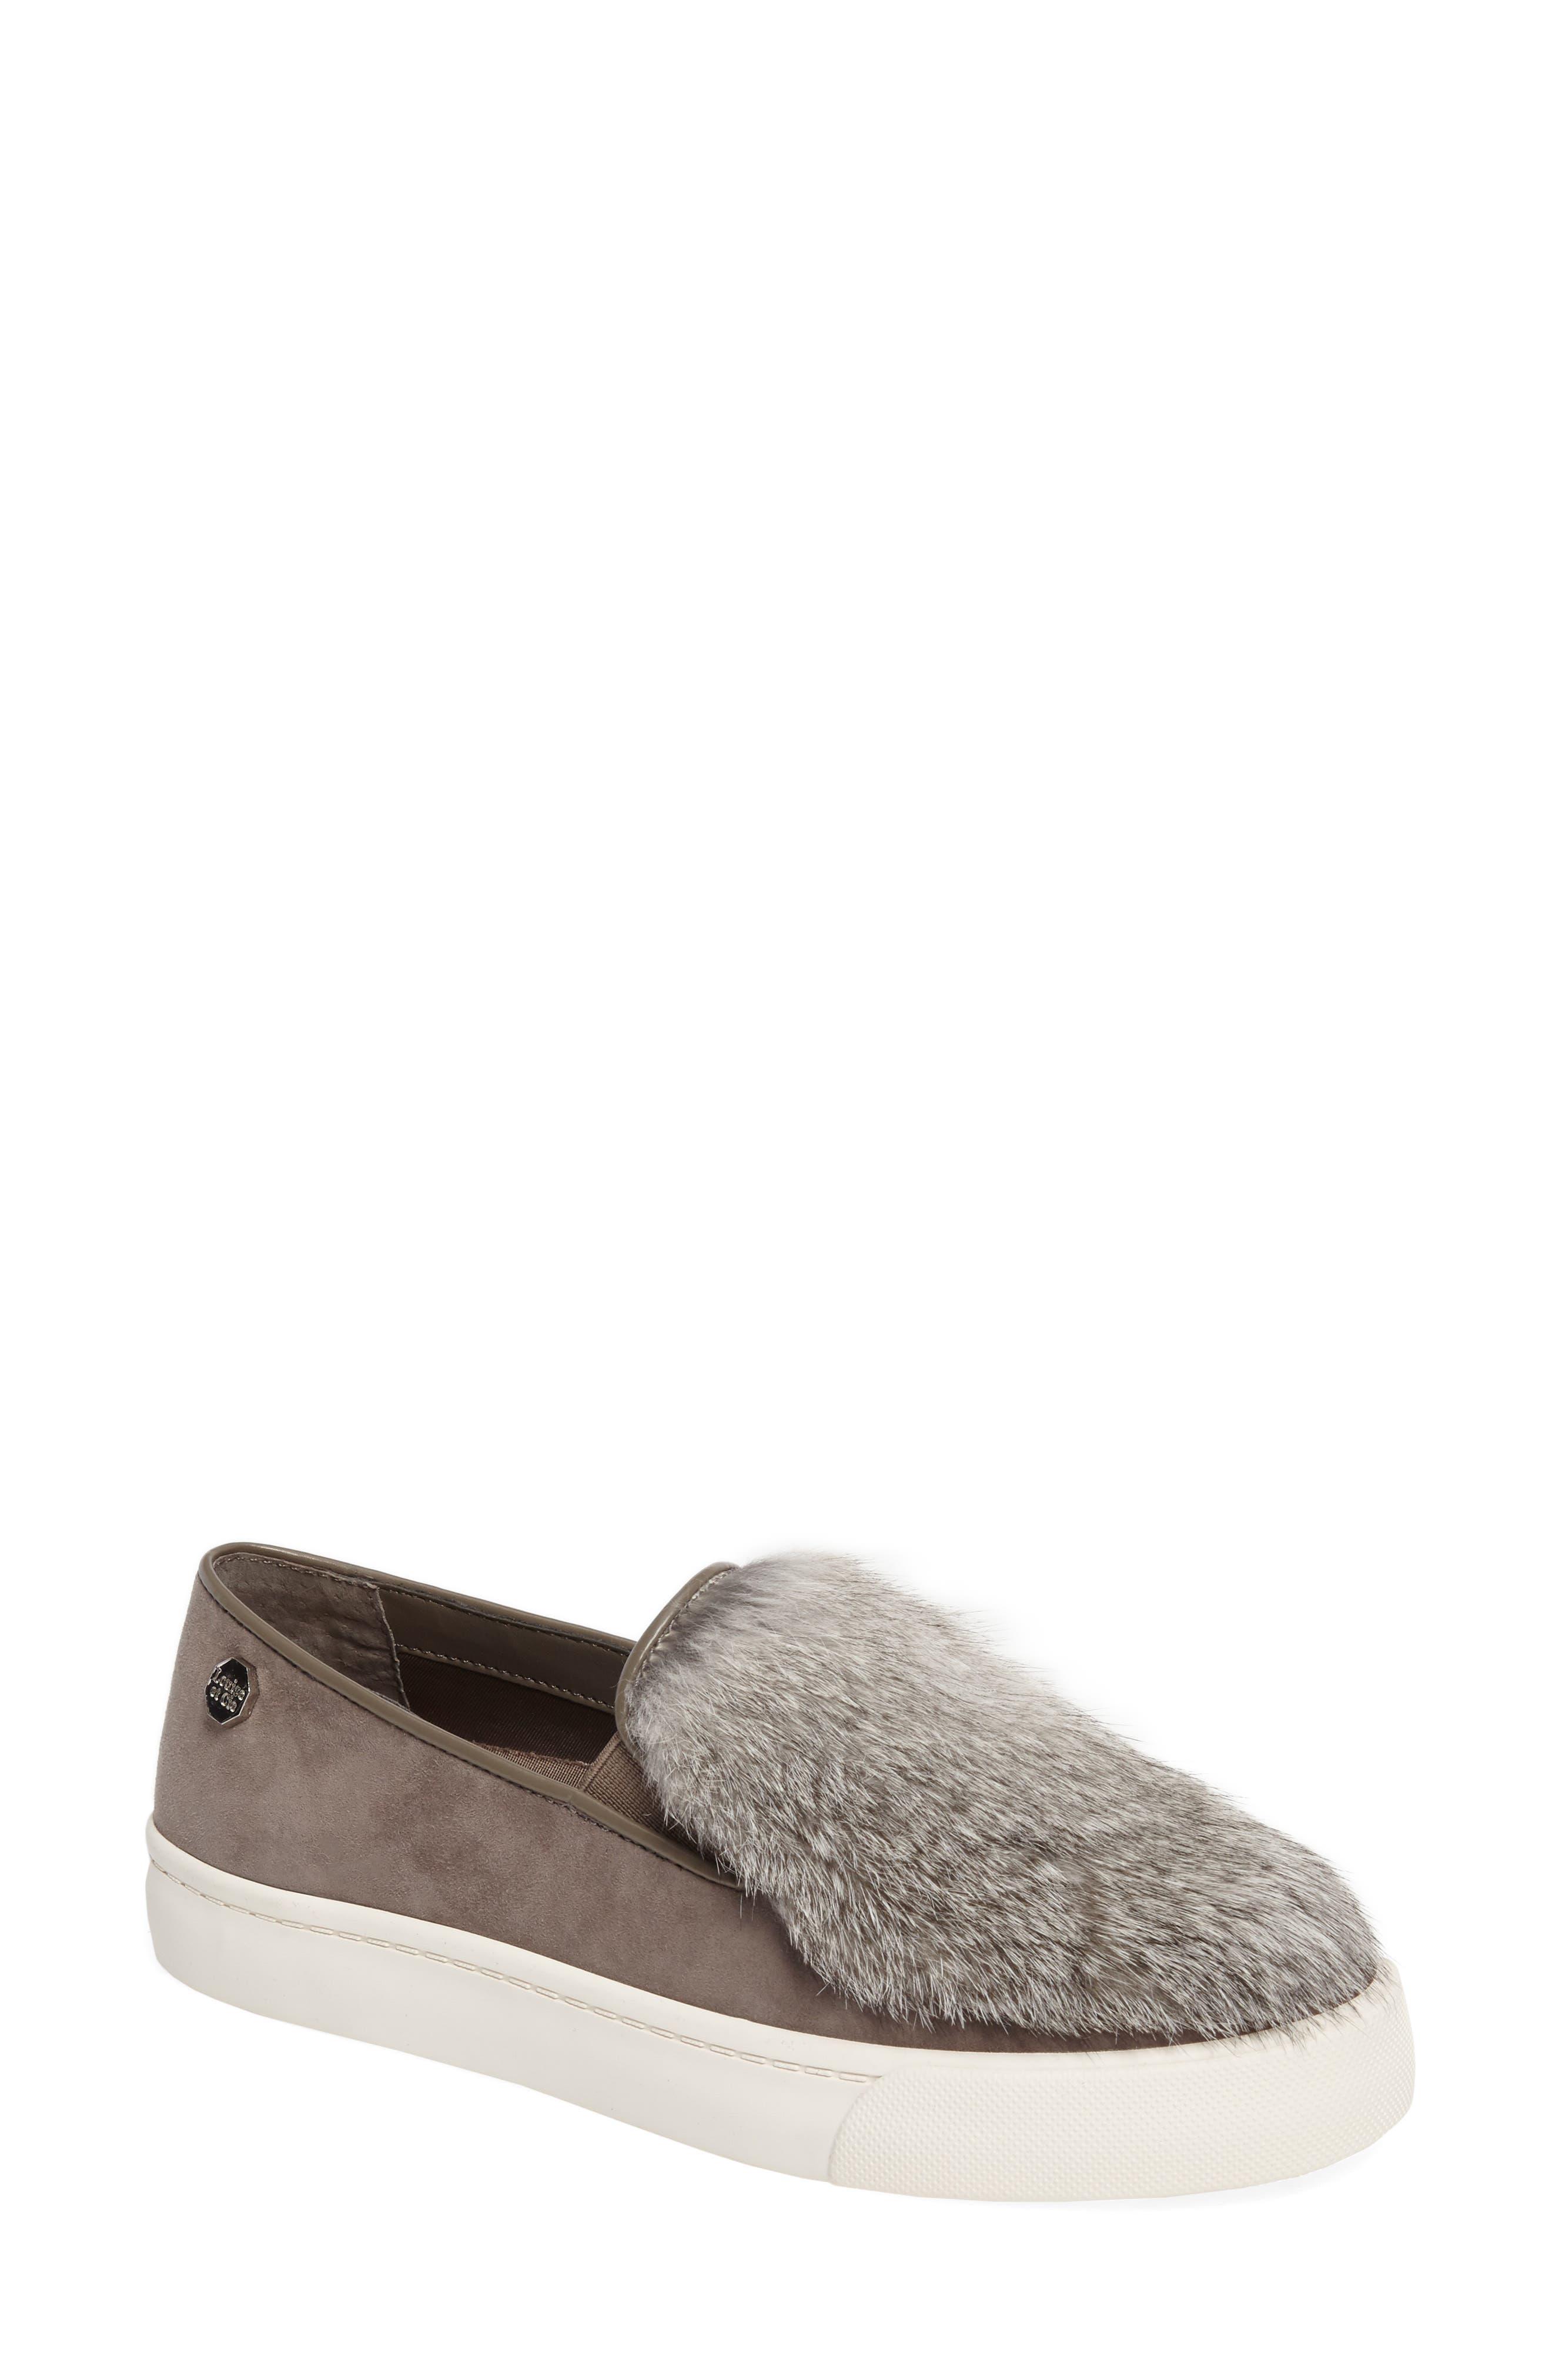 Alternate Image 1 Selected - Louise et Cie Bershner Genuine Rabbit Fur Slip-On Sneaker (Women)